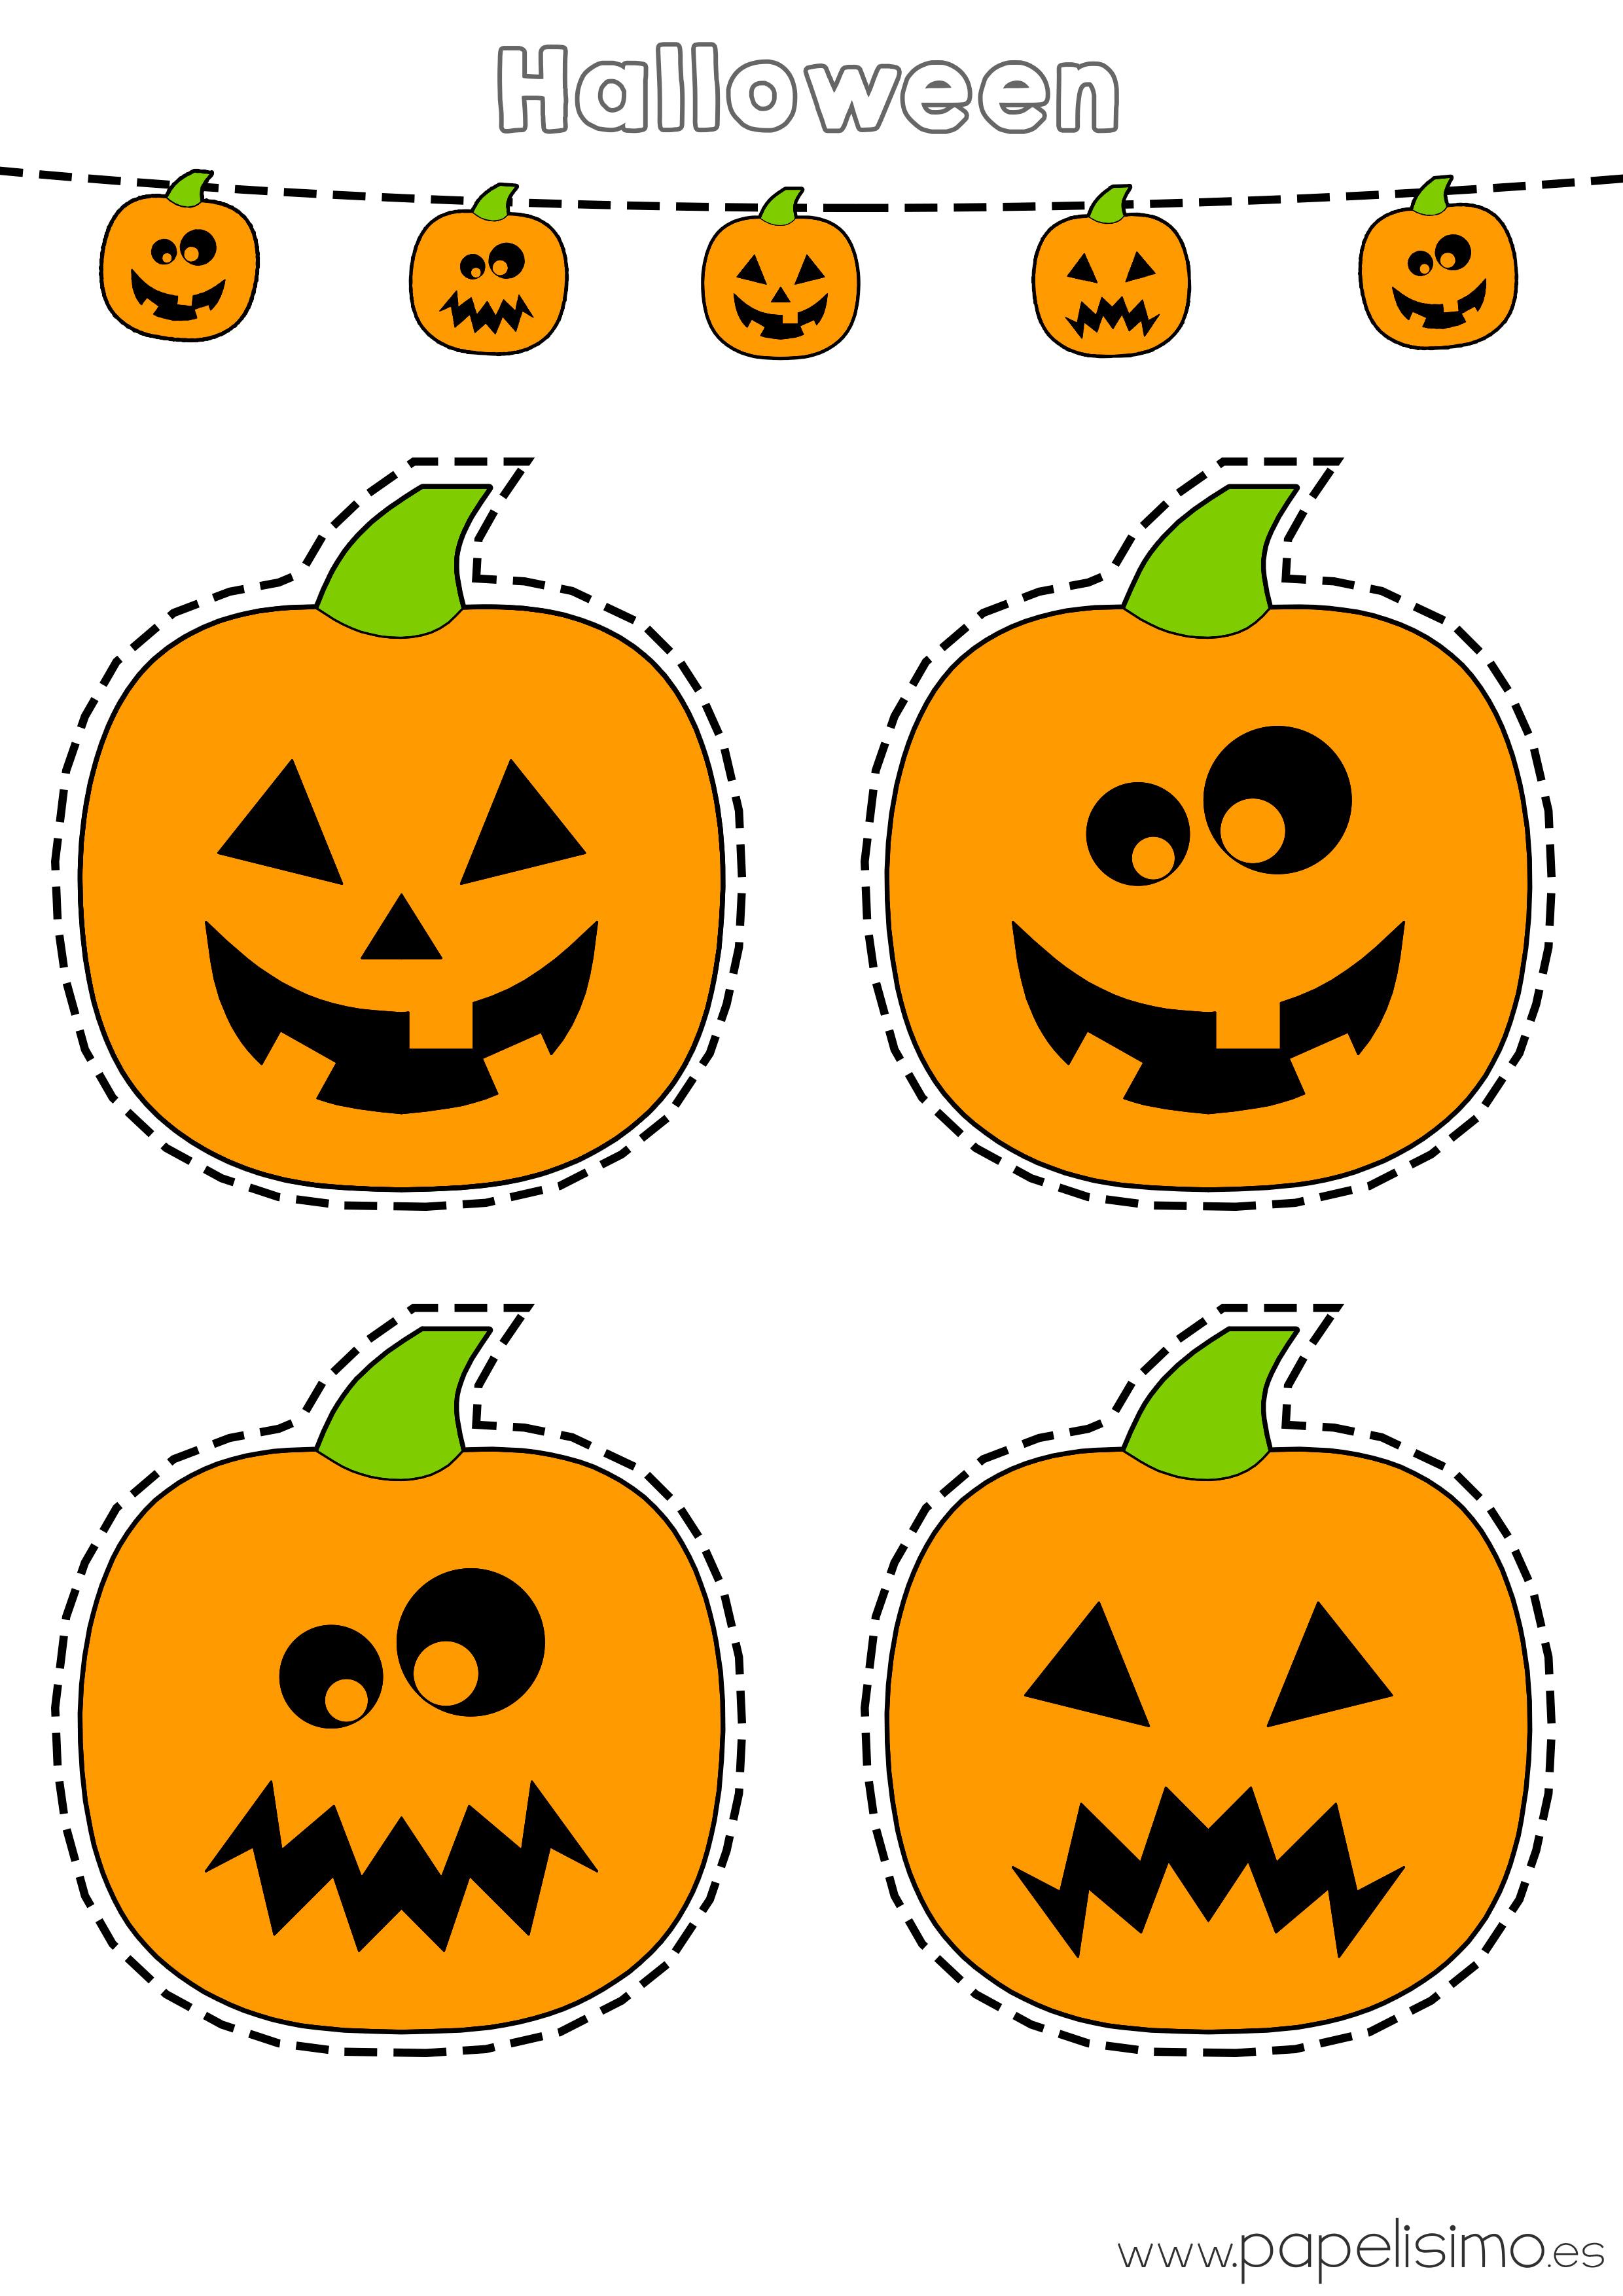 Dibujos de calabazas de halloween para recortar papelisimo - Plantillas para decorar calabazas halloween ...